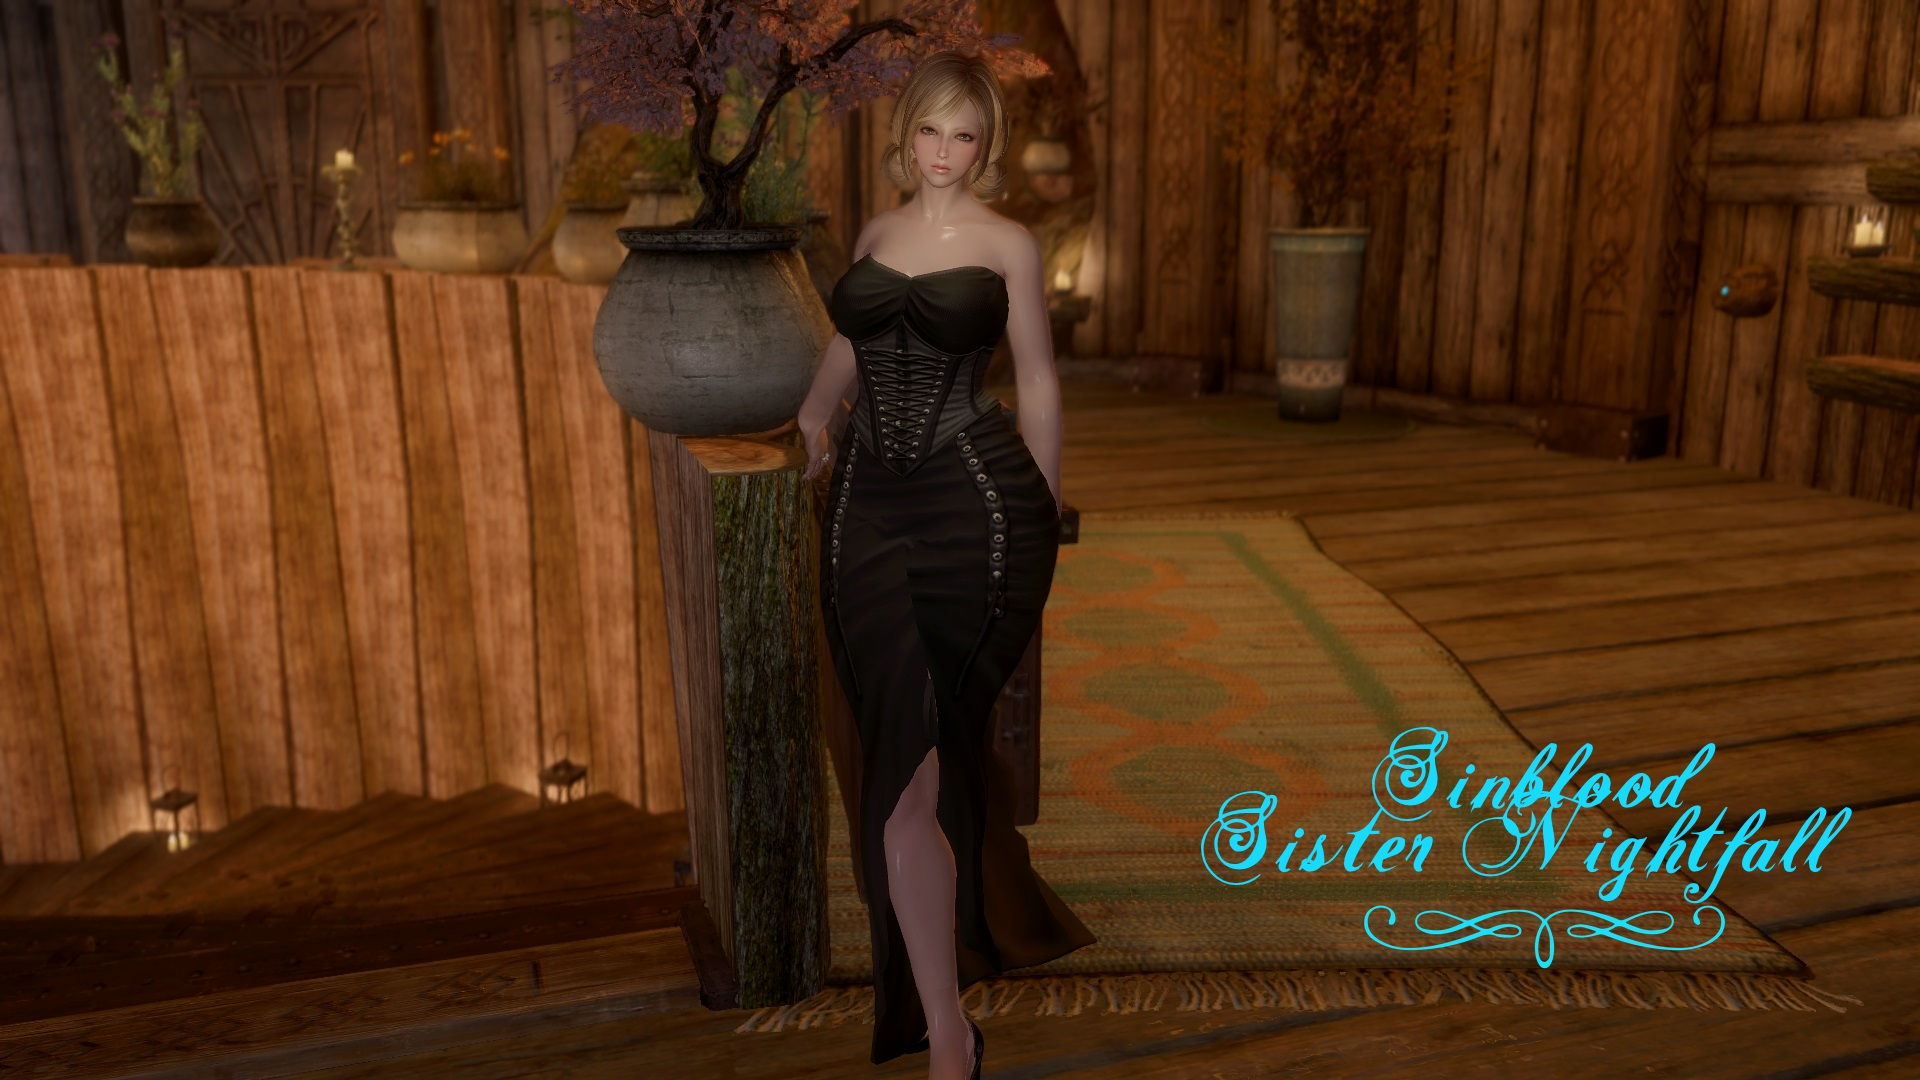 Sinblood_Sister_Nightfall.jpg